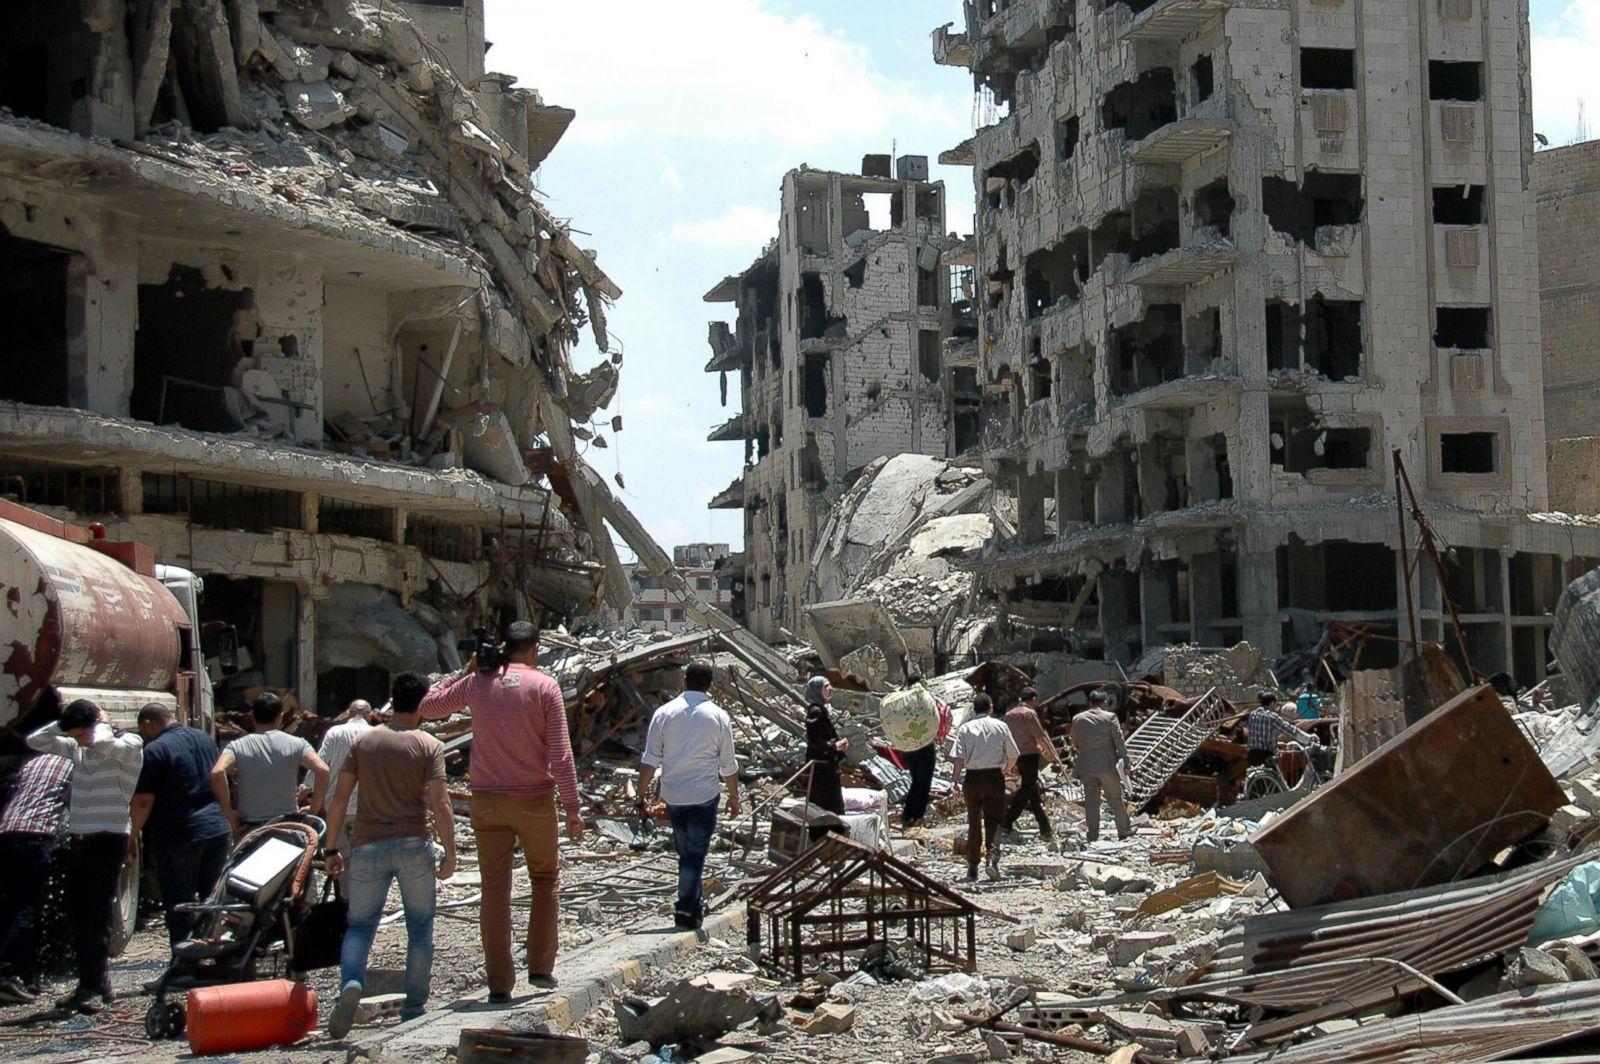 CONFLICT IN SYRIA EBOOK DOWNLOAD